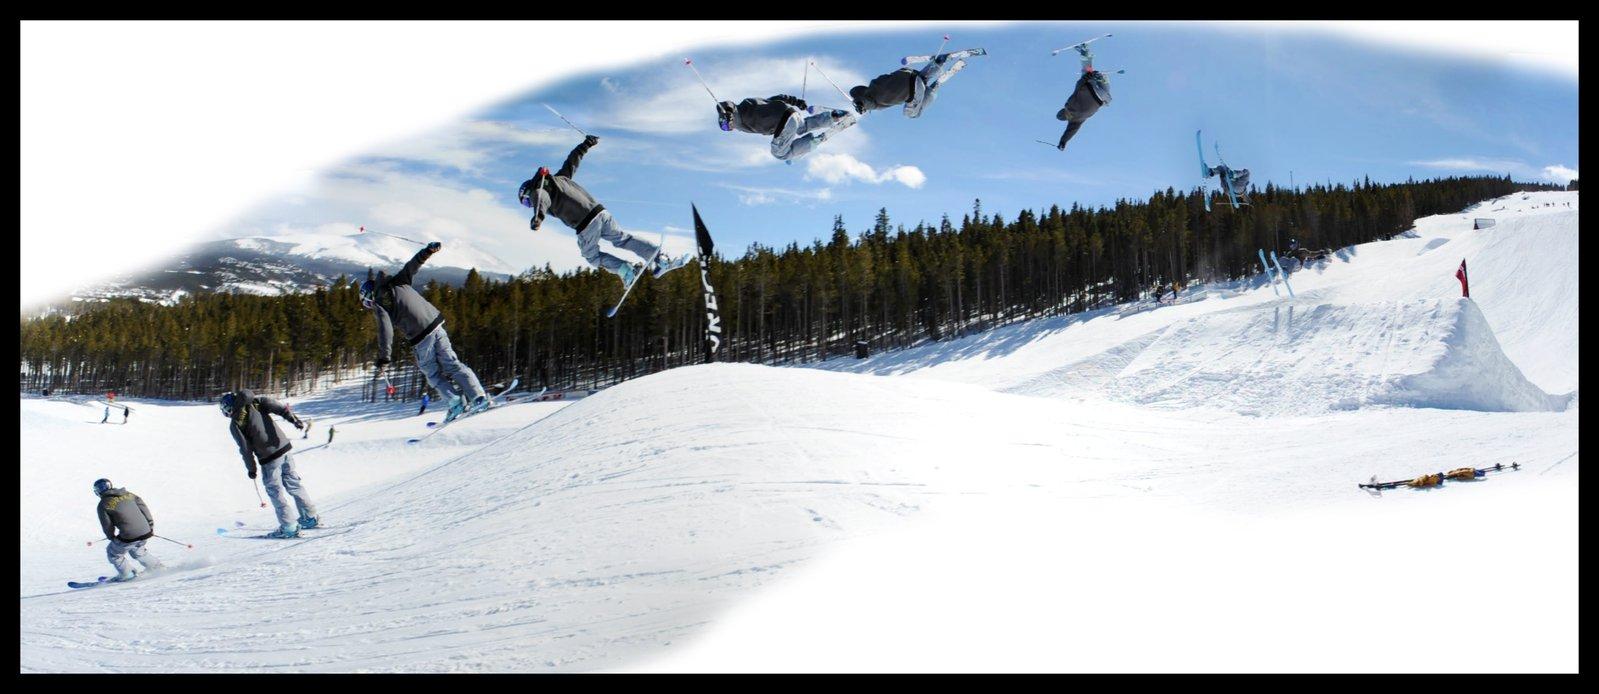 Flat 3 at breck